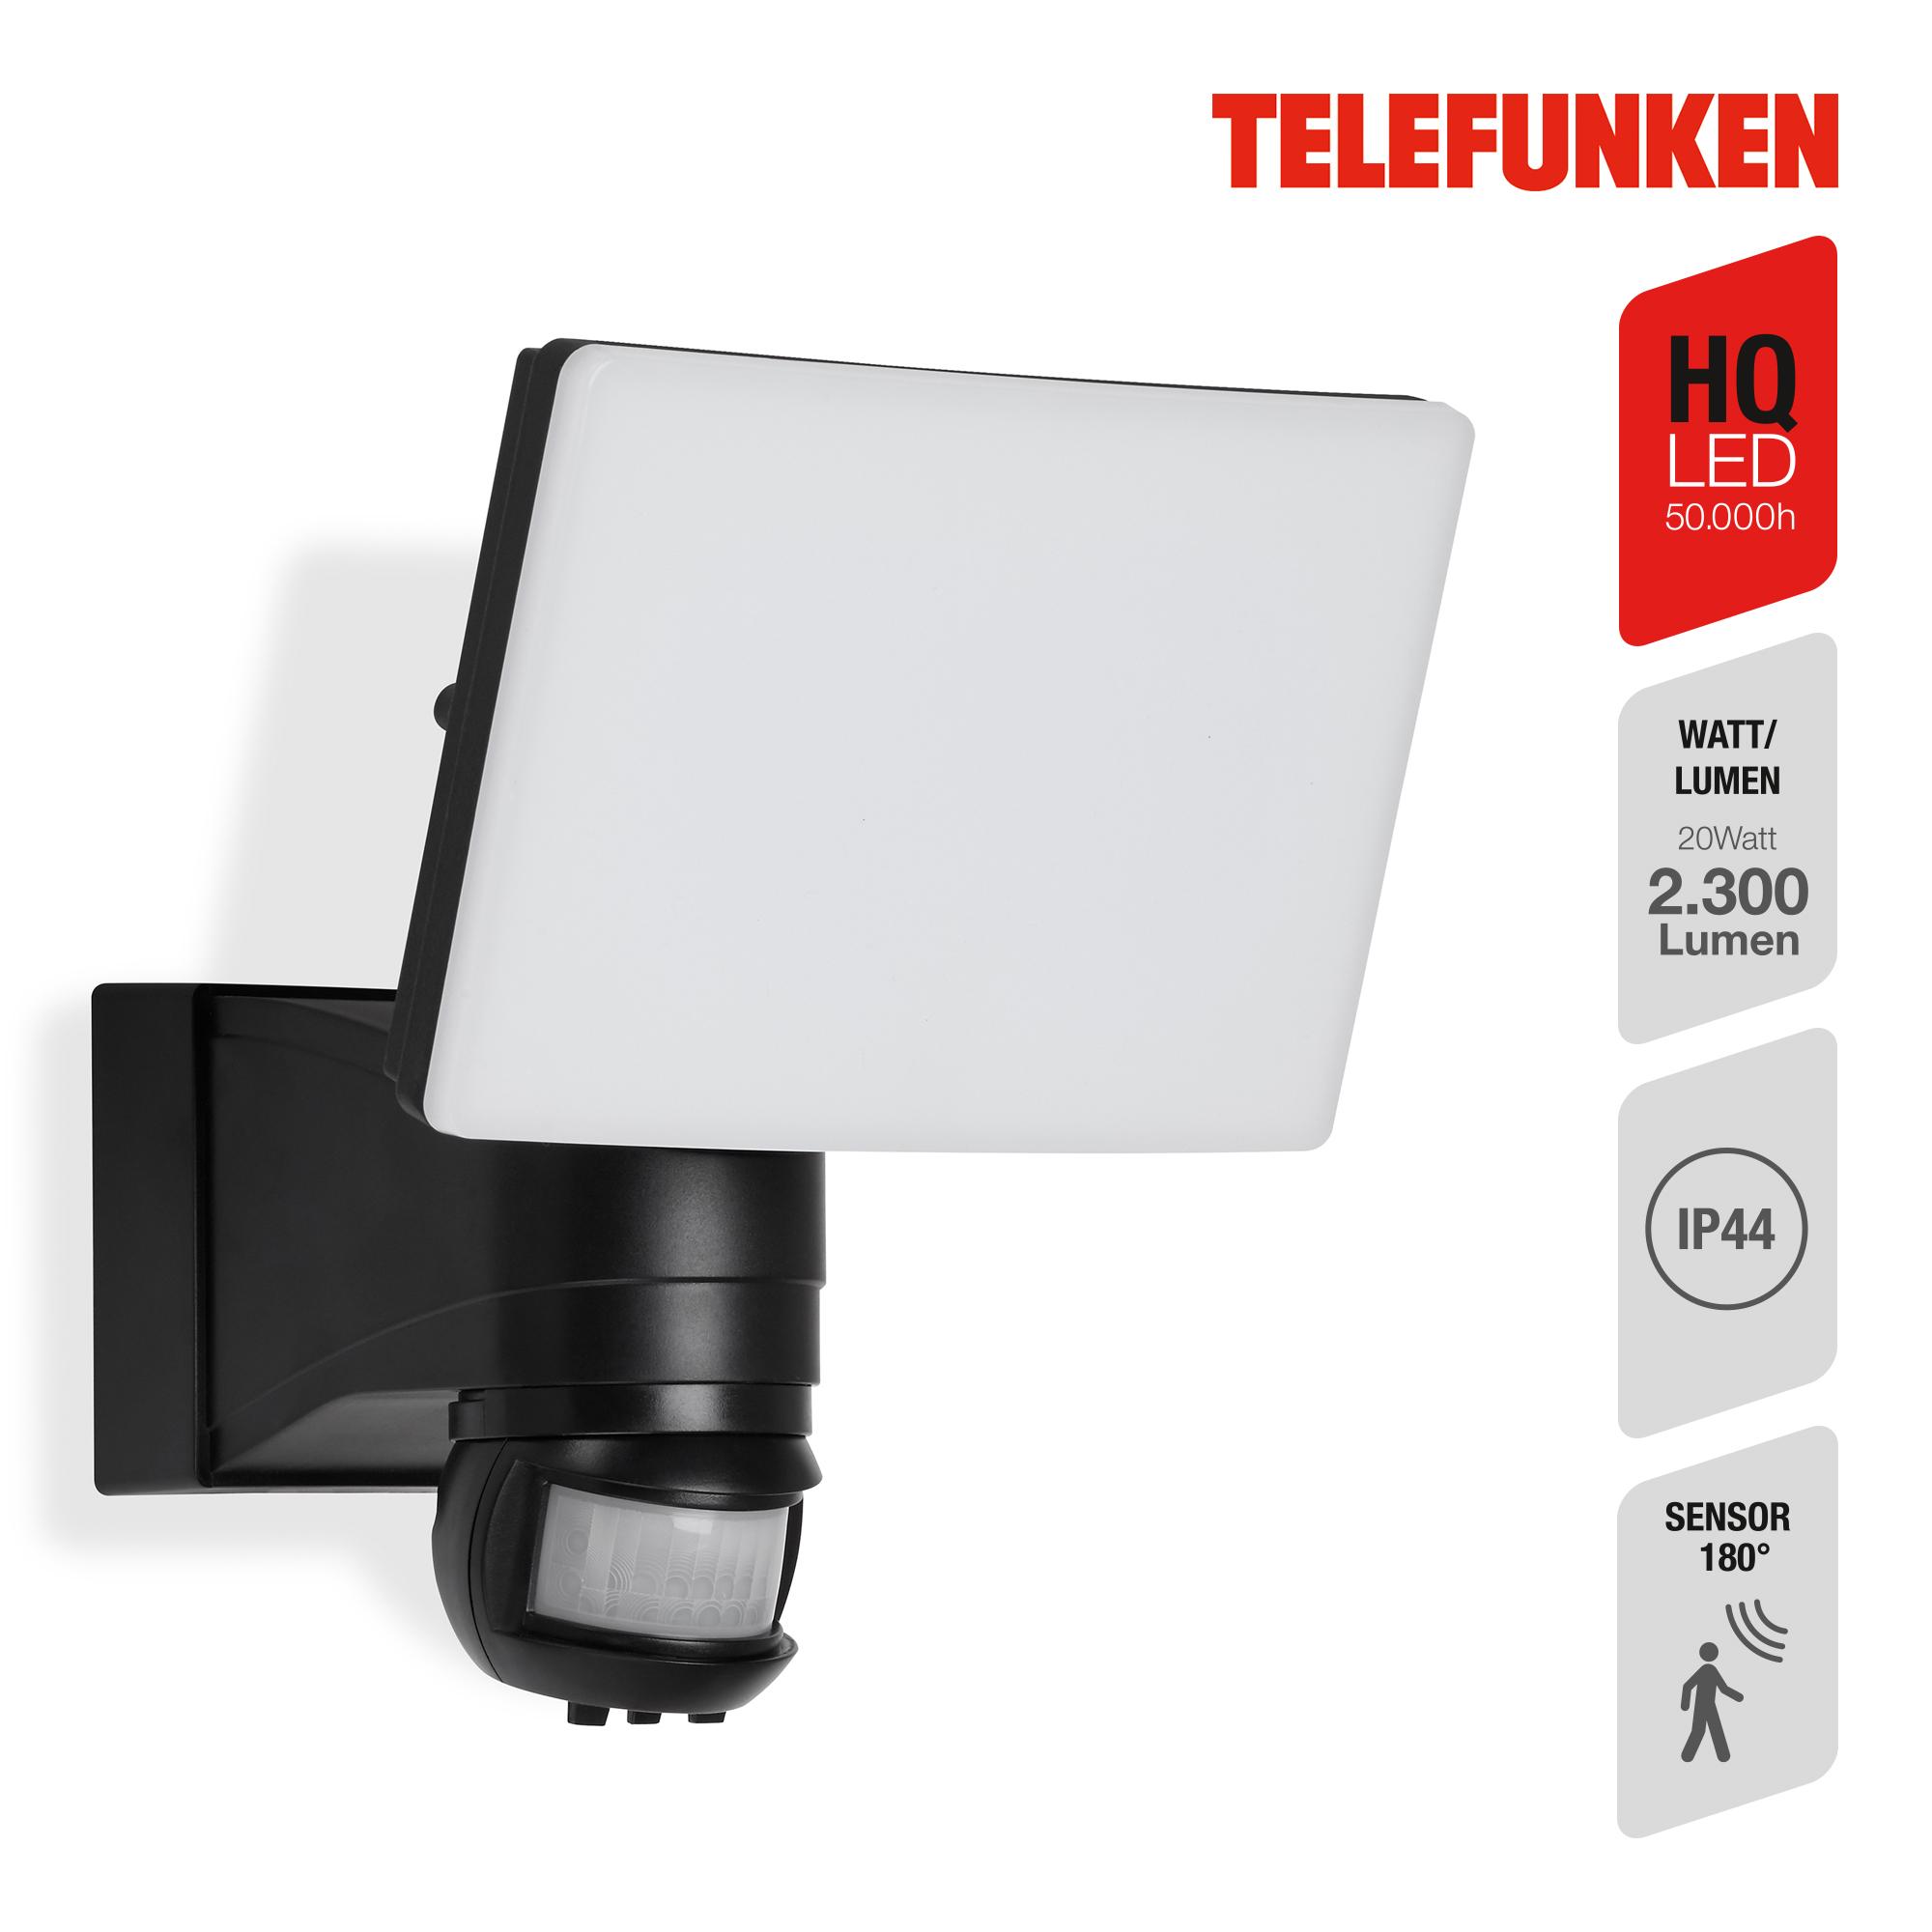 TELEFUNKEN LED Sensor Außenstrahler Schwarz